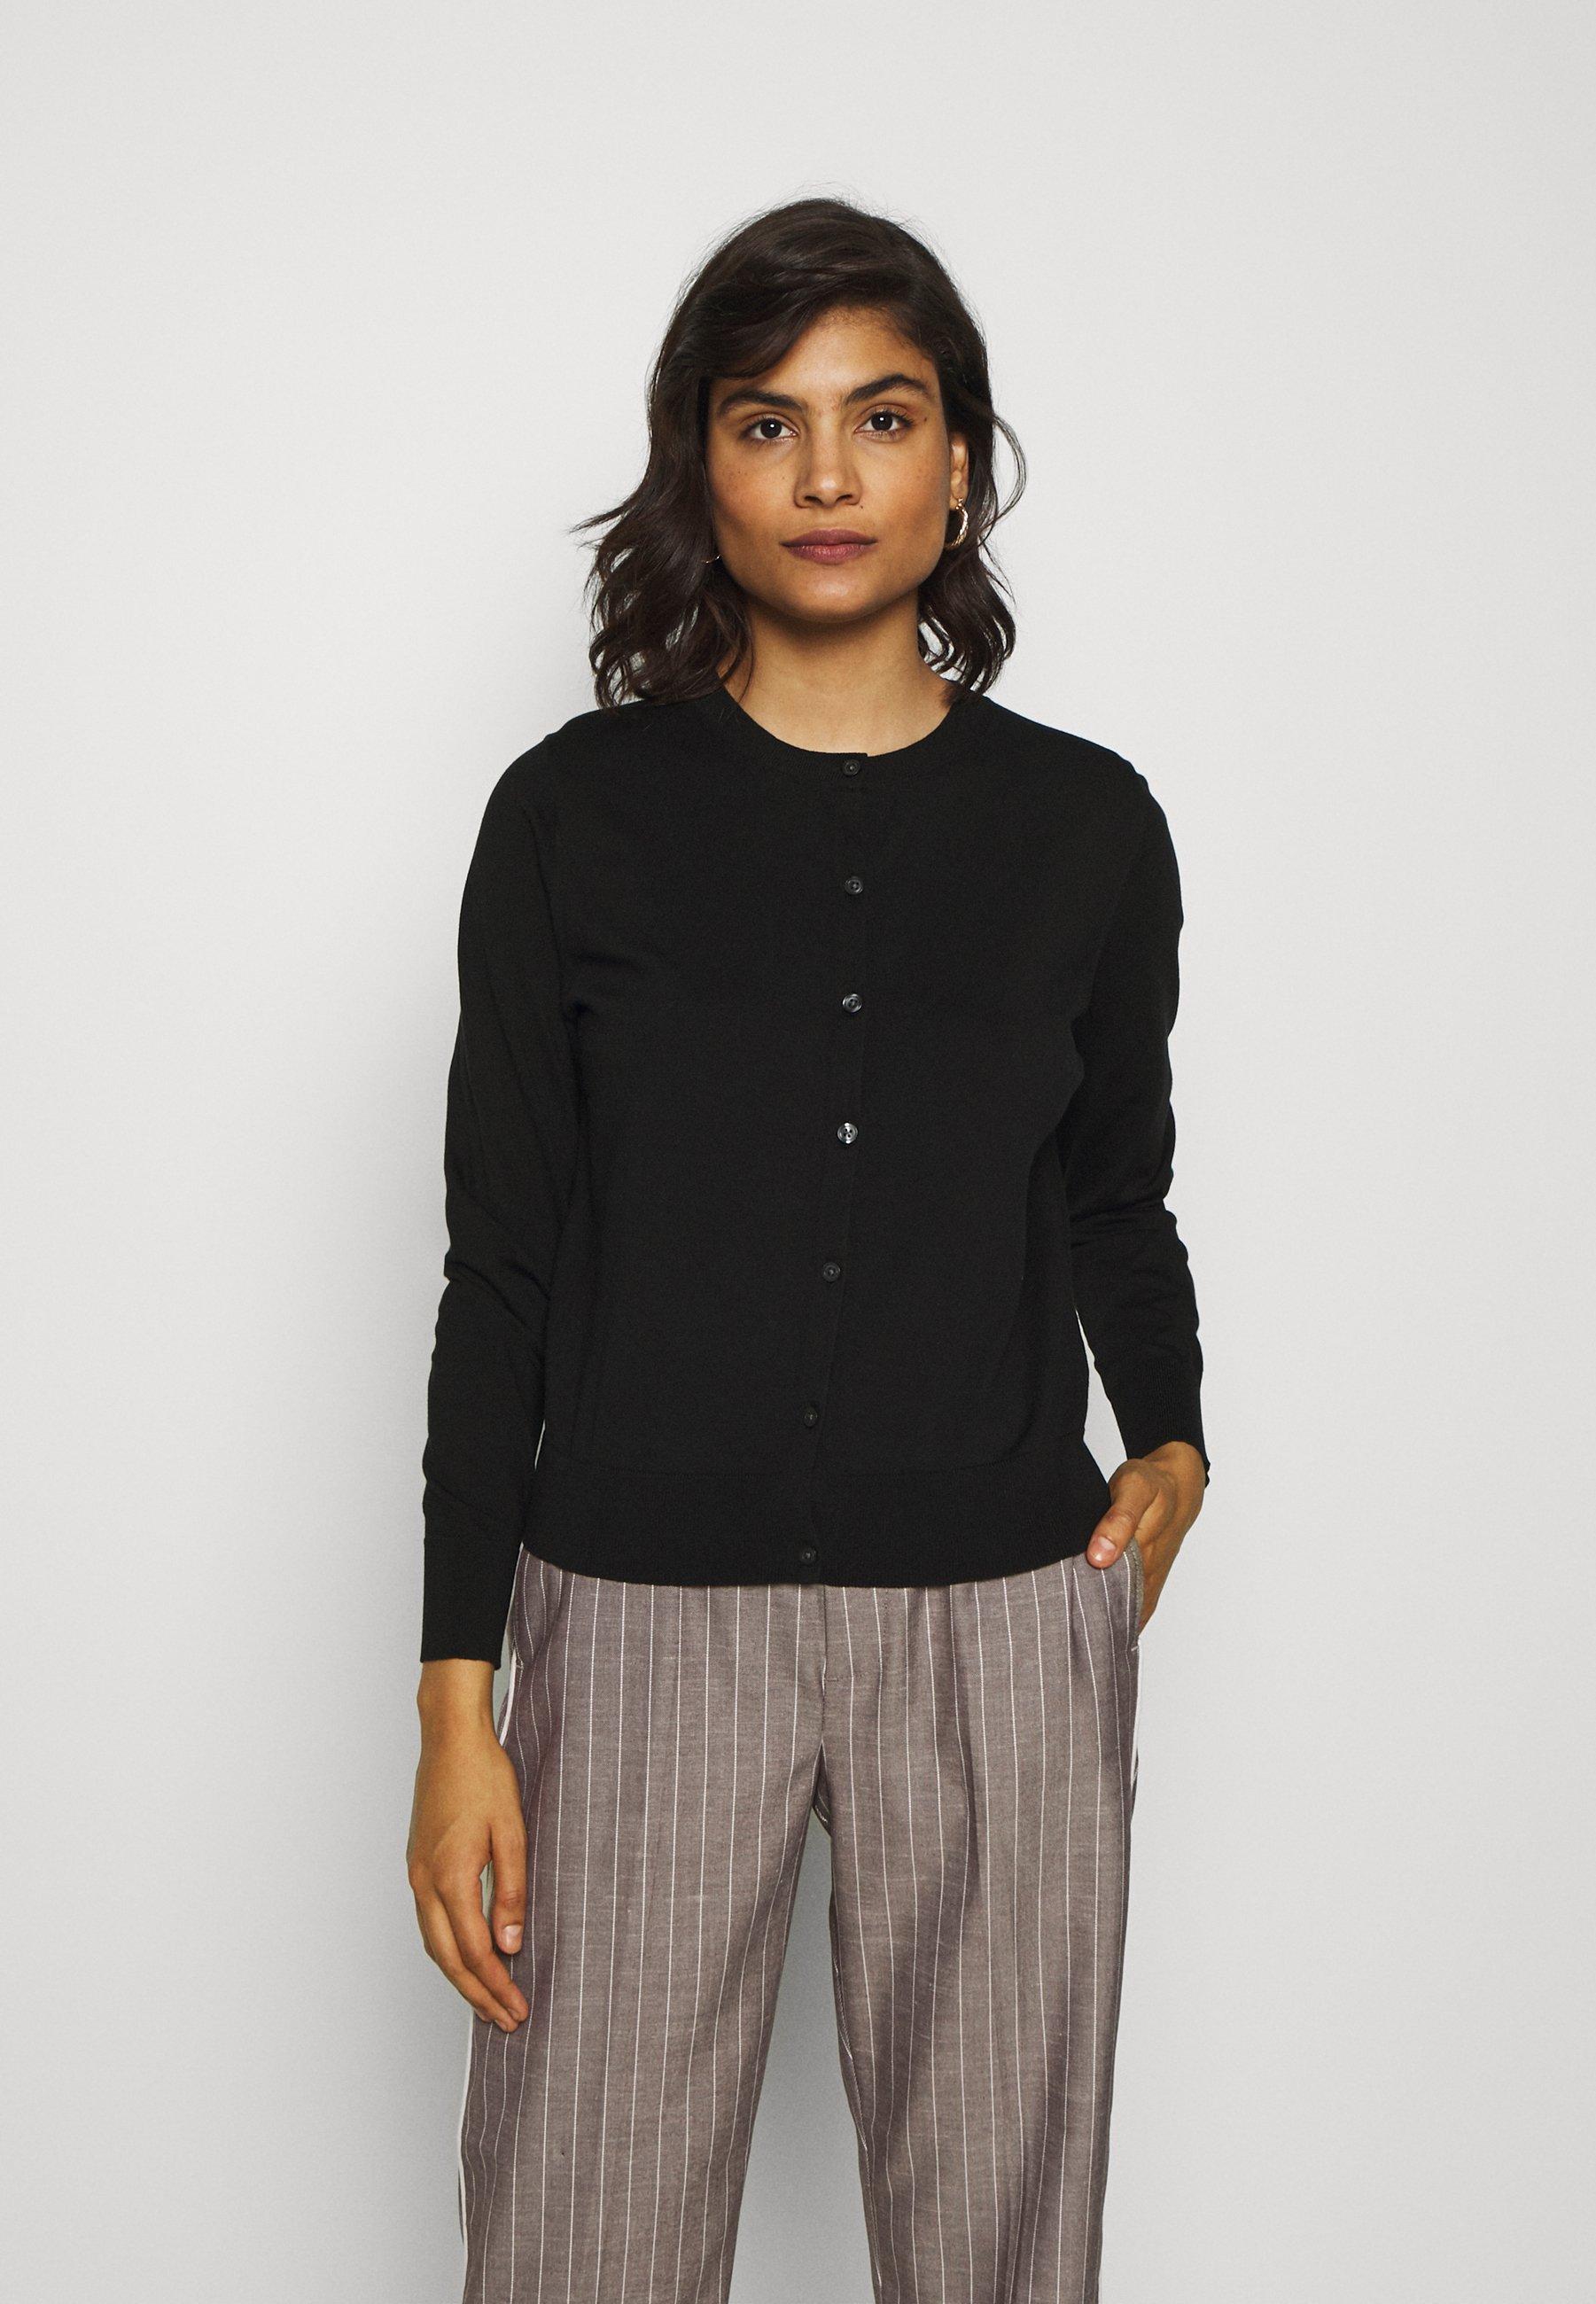 New Arrival Fashion Shopping Women's Clothing Banana Republic CARDIGAN Cardigan black dNgTTgbeh 83KSEcXHr